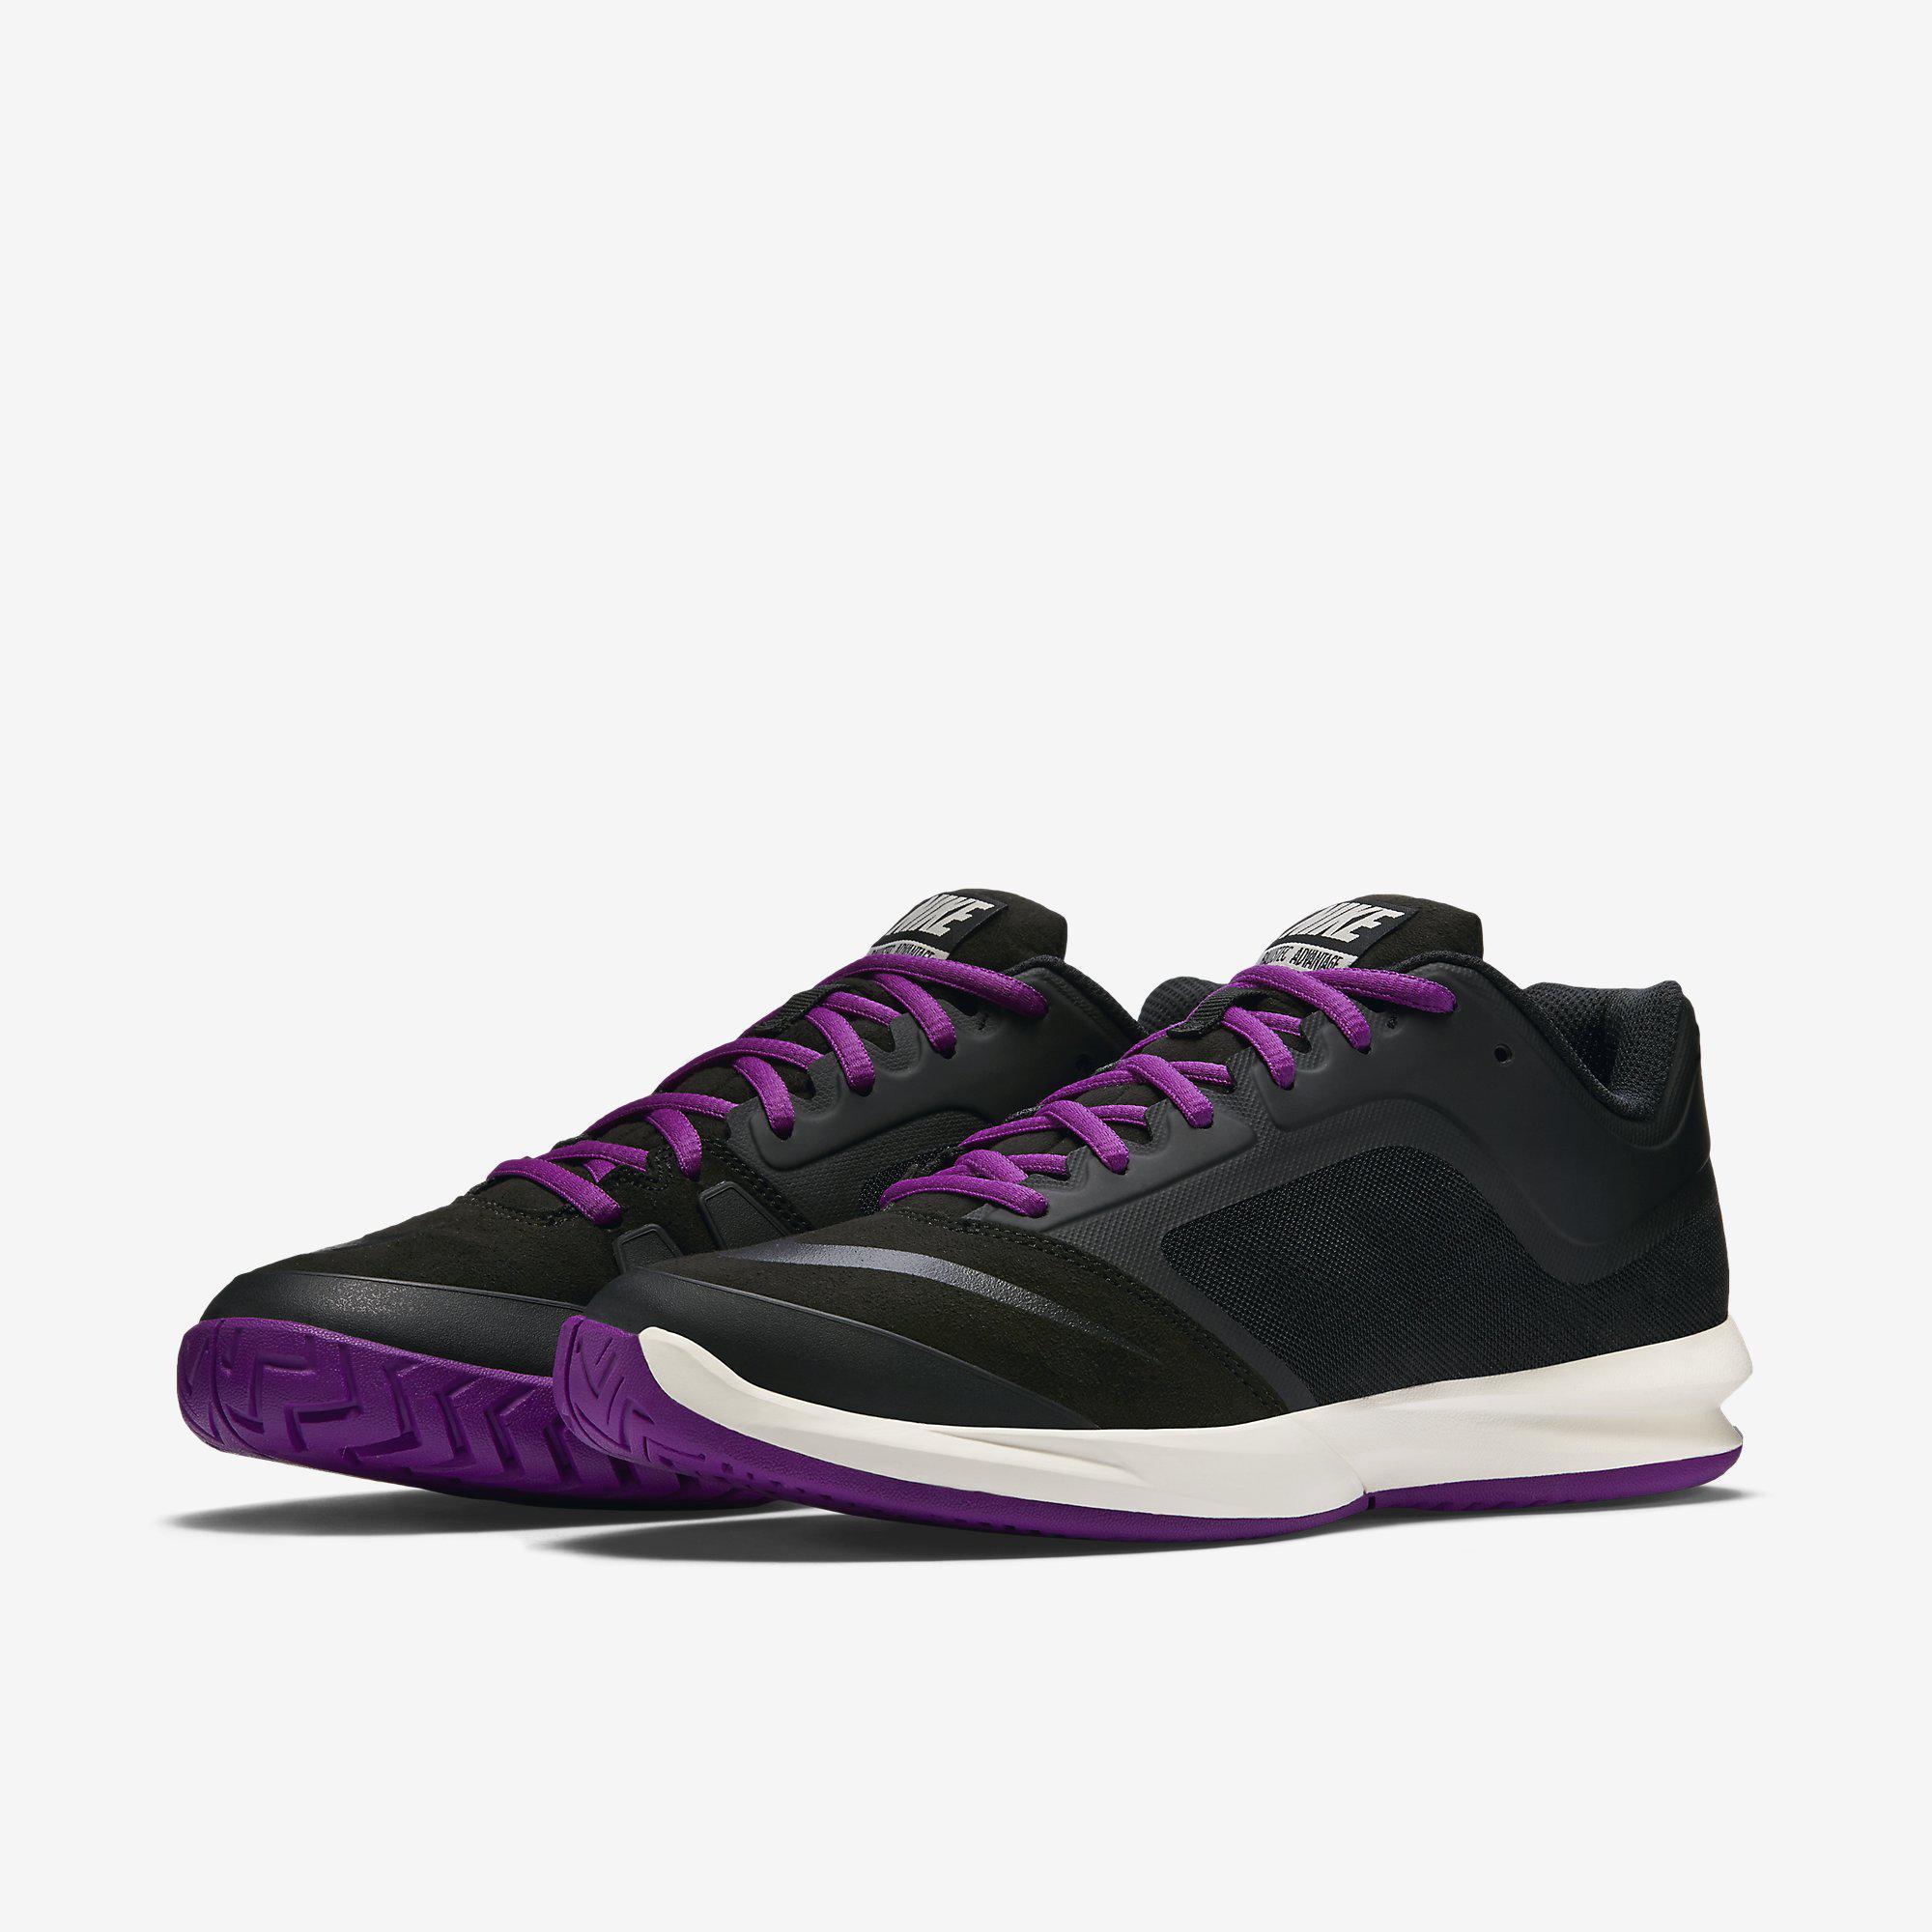 Nike Dual Fusion Womens Tennis Shoes